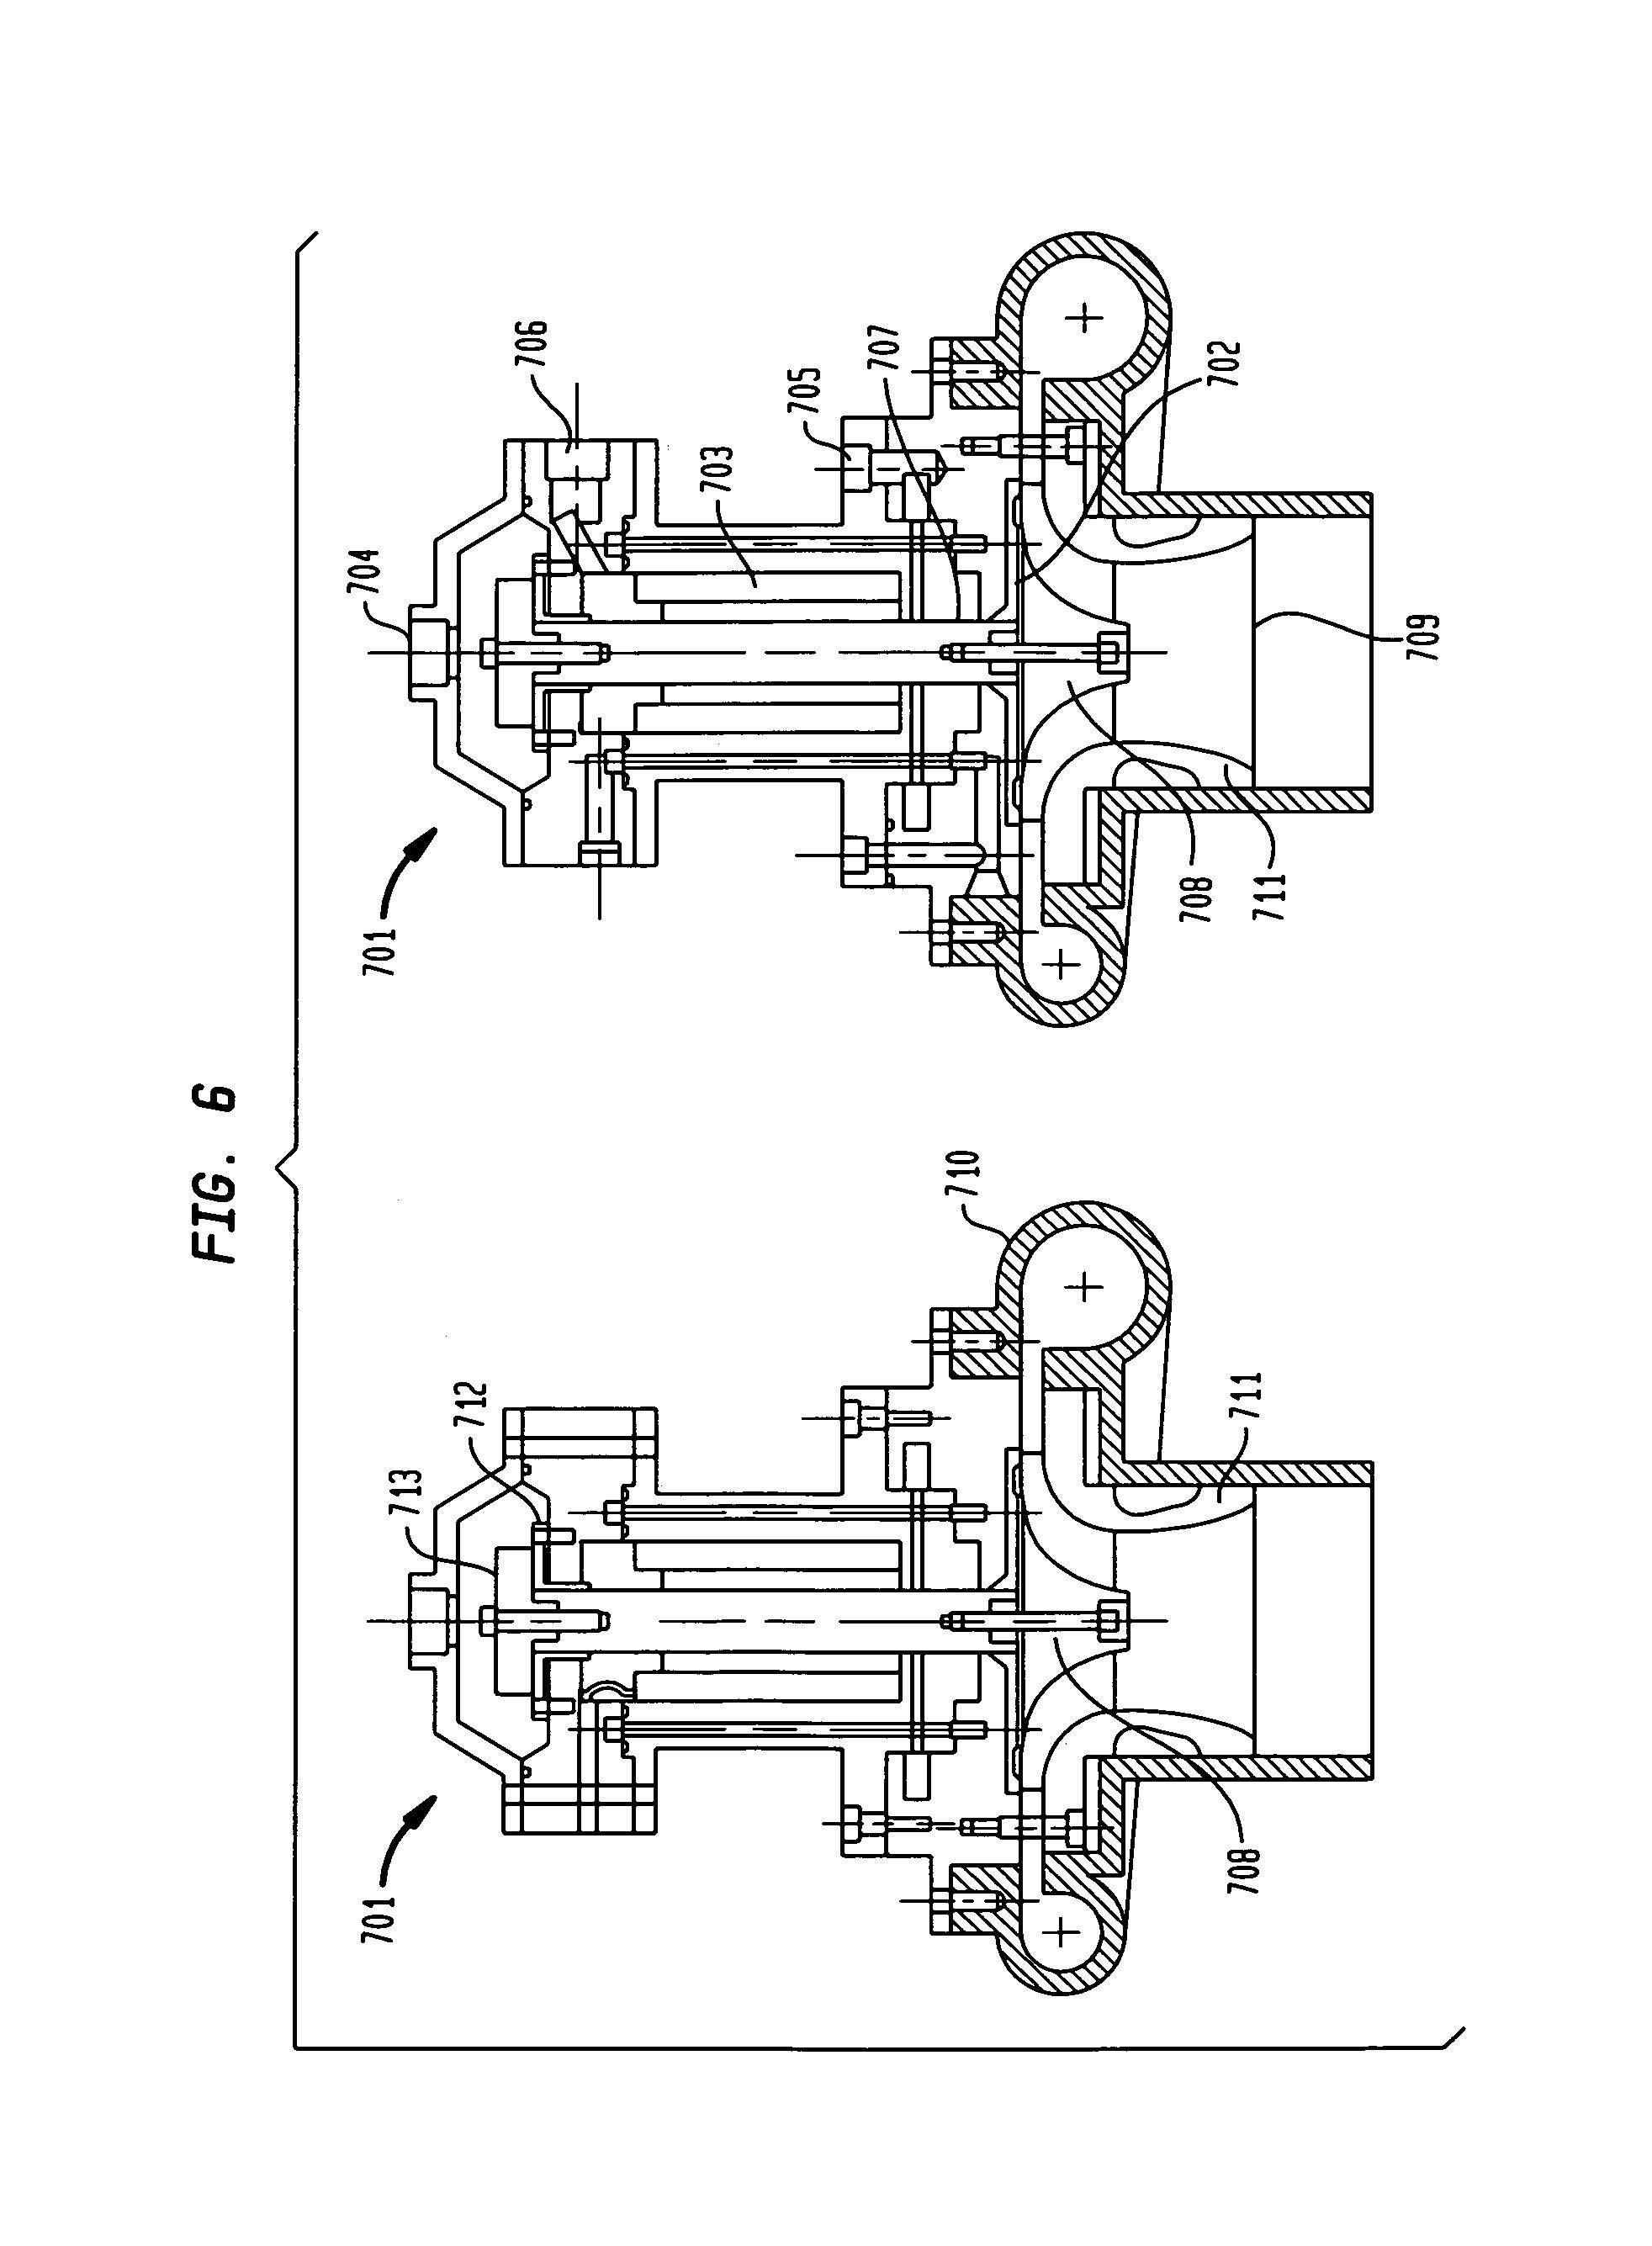 Nissan Altima Engine Diagram Blueprints Electrical Wiring Diagrams 2009 Jet Pump Utilitech Troubleshooting 2001